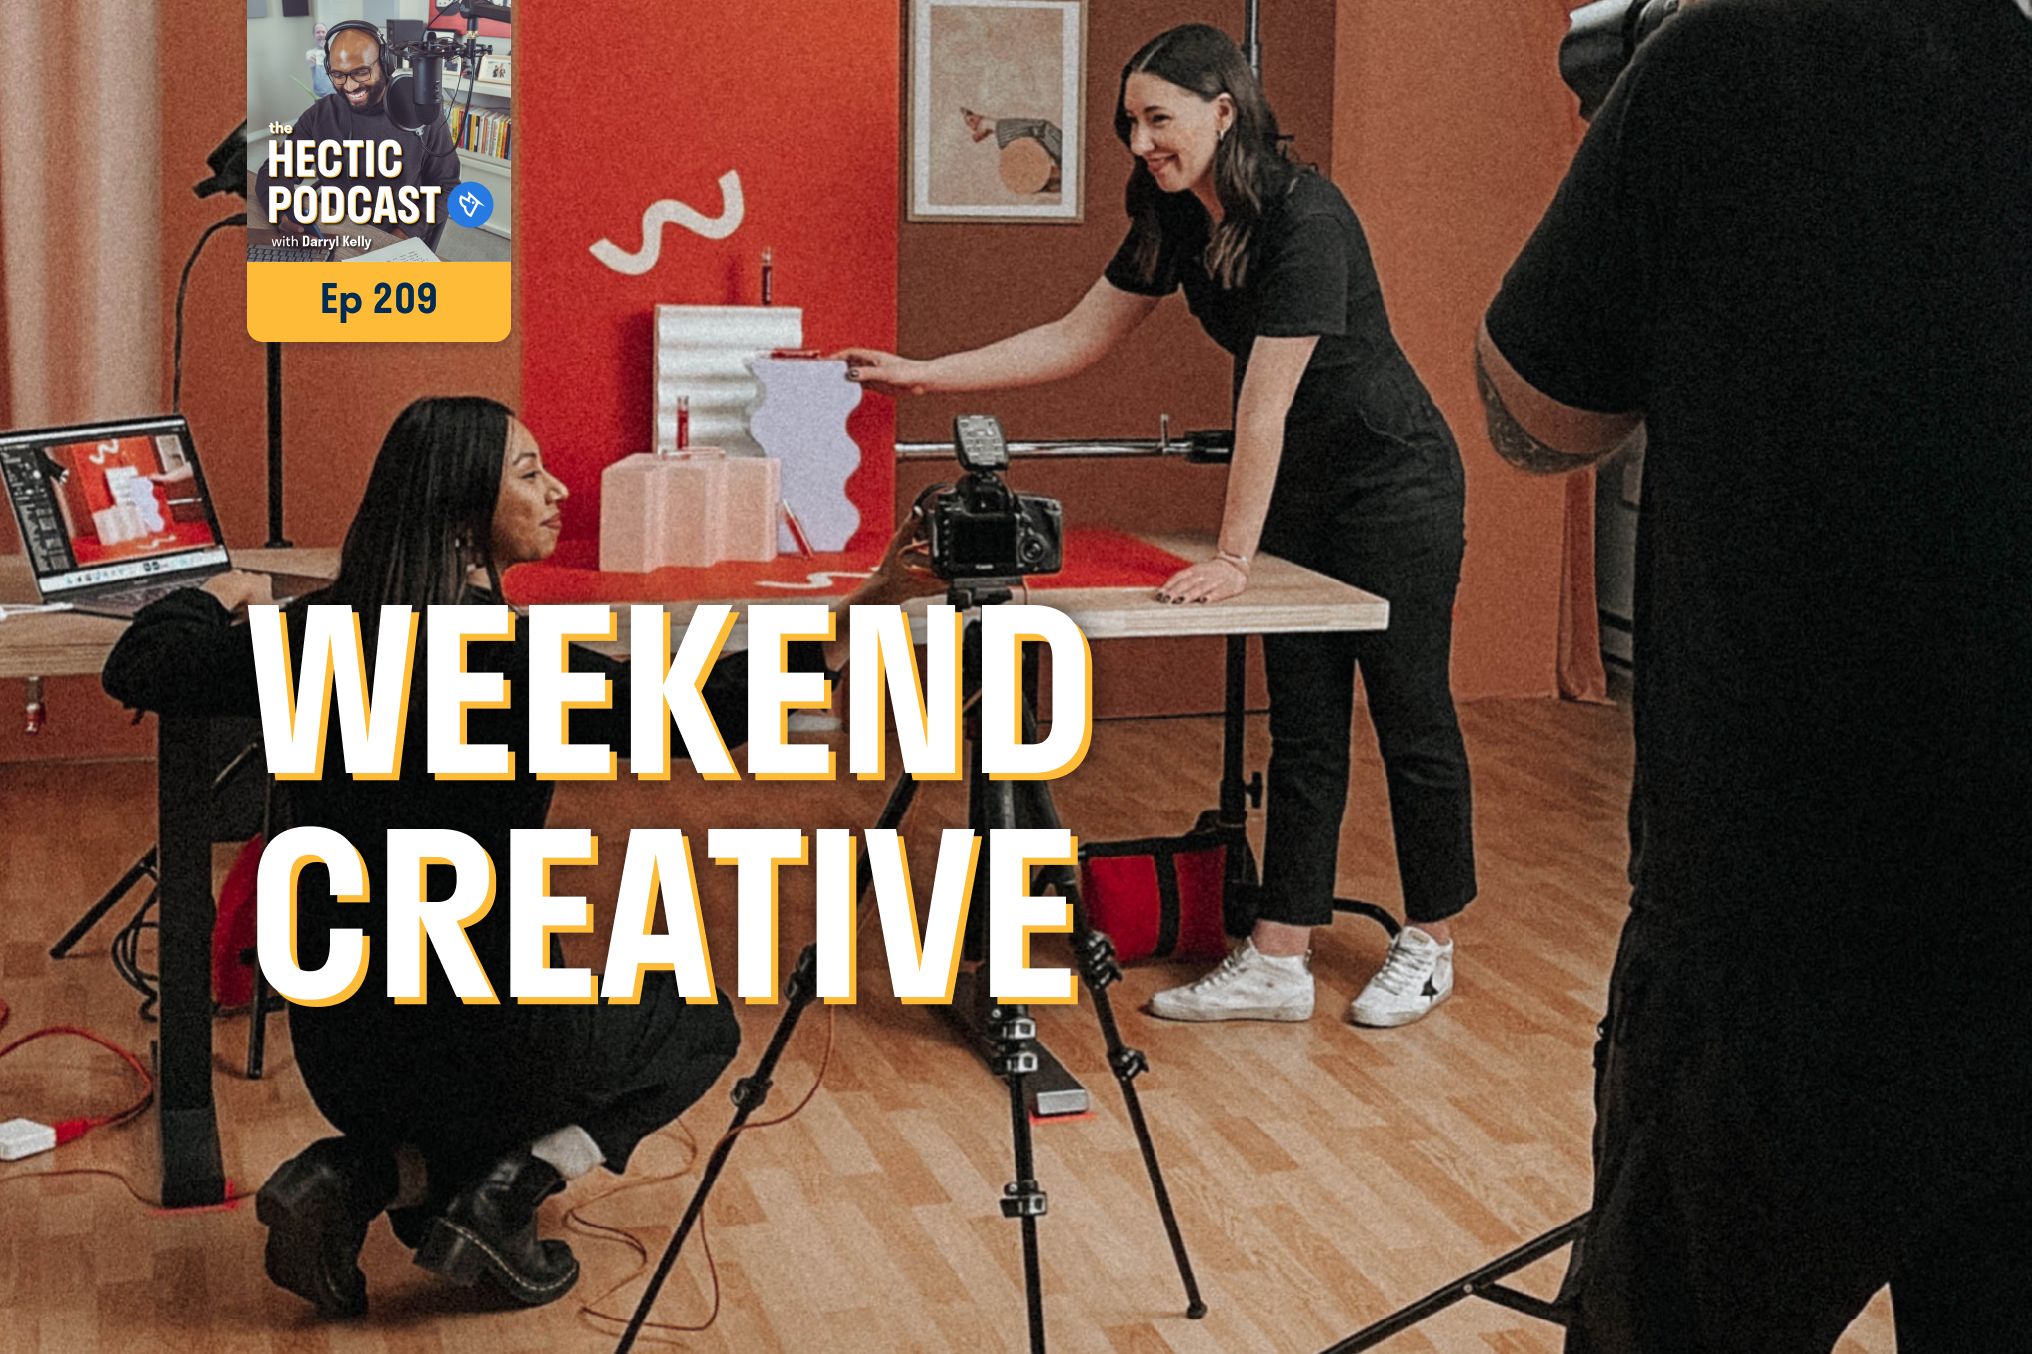 The Weekend Creative